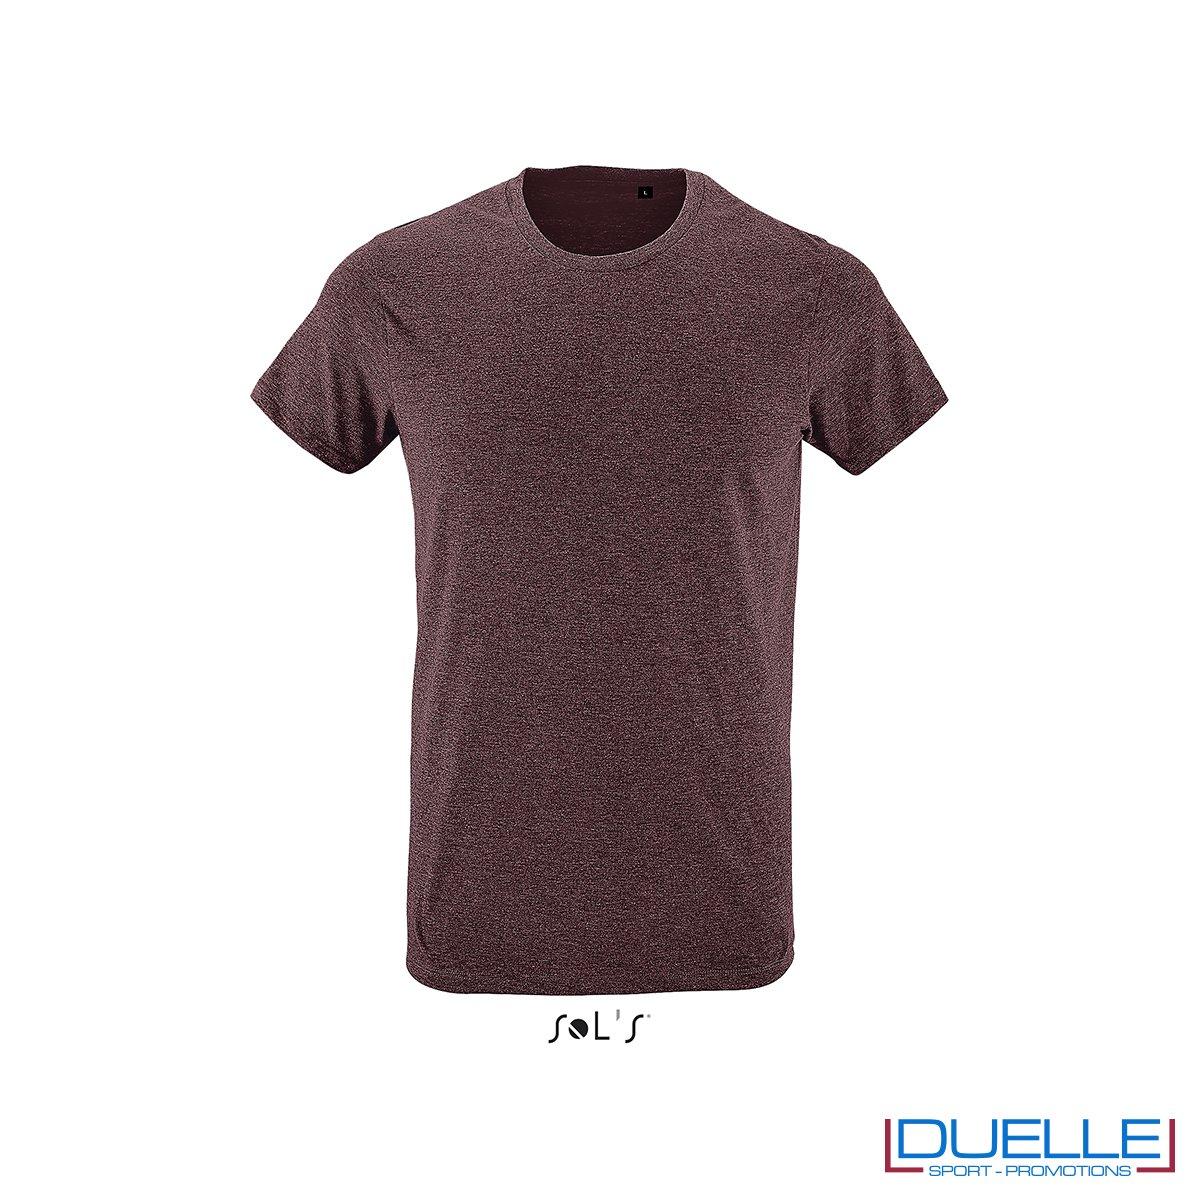 Tshirt girocollo personalizzata slim-fit colore bordeaux melange